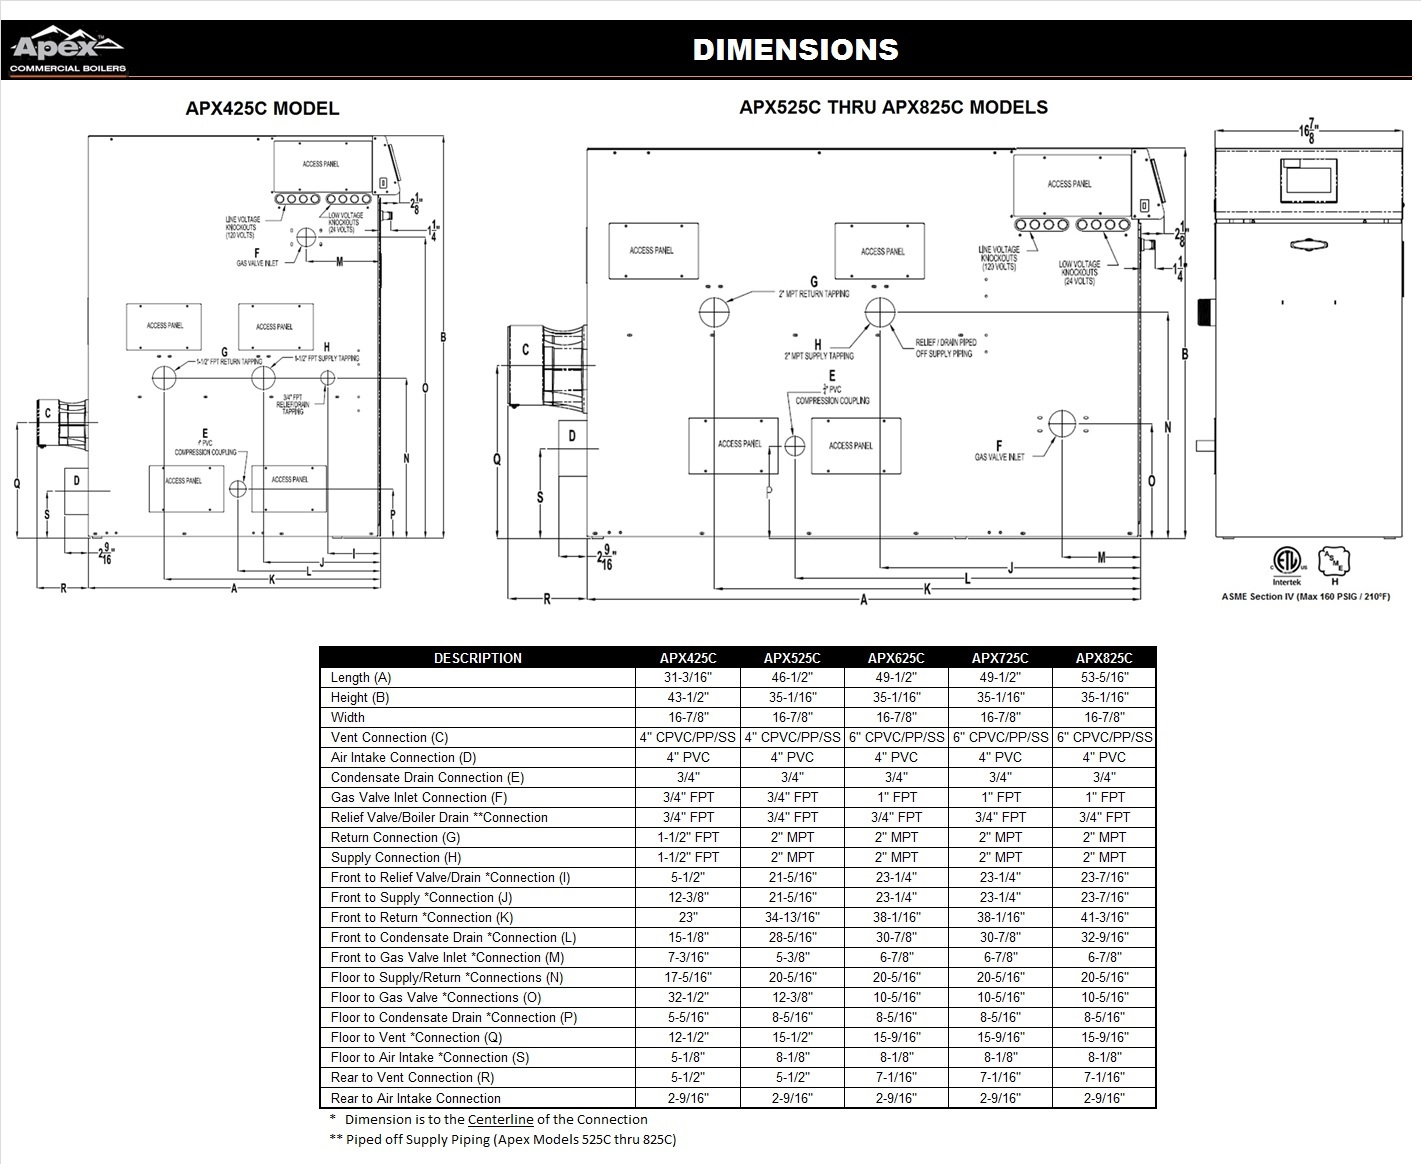 tempstar furnace parts diagram 1999 mustang wiring source